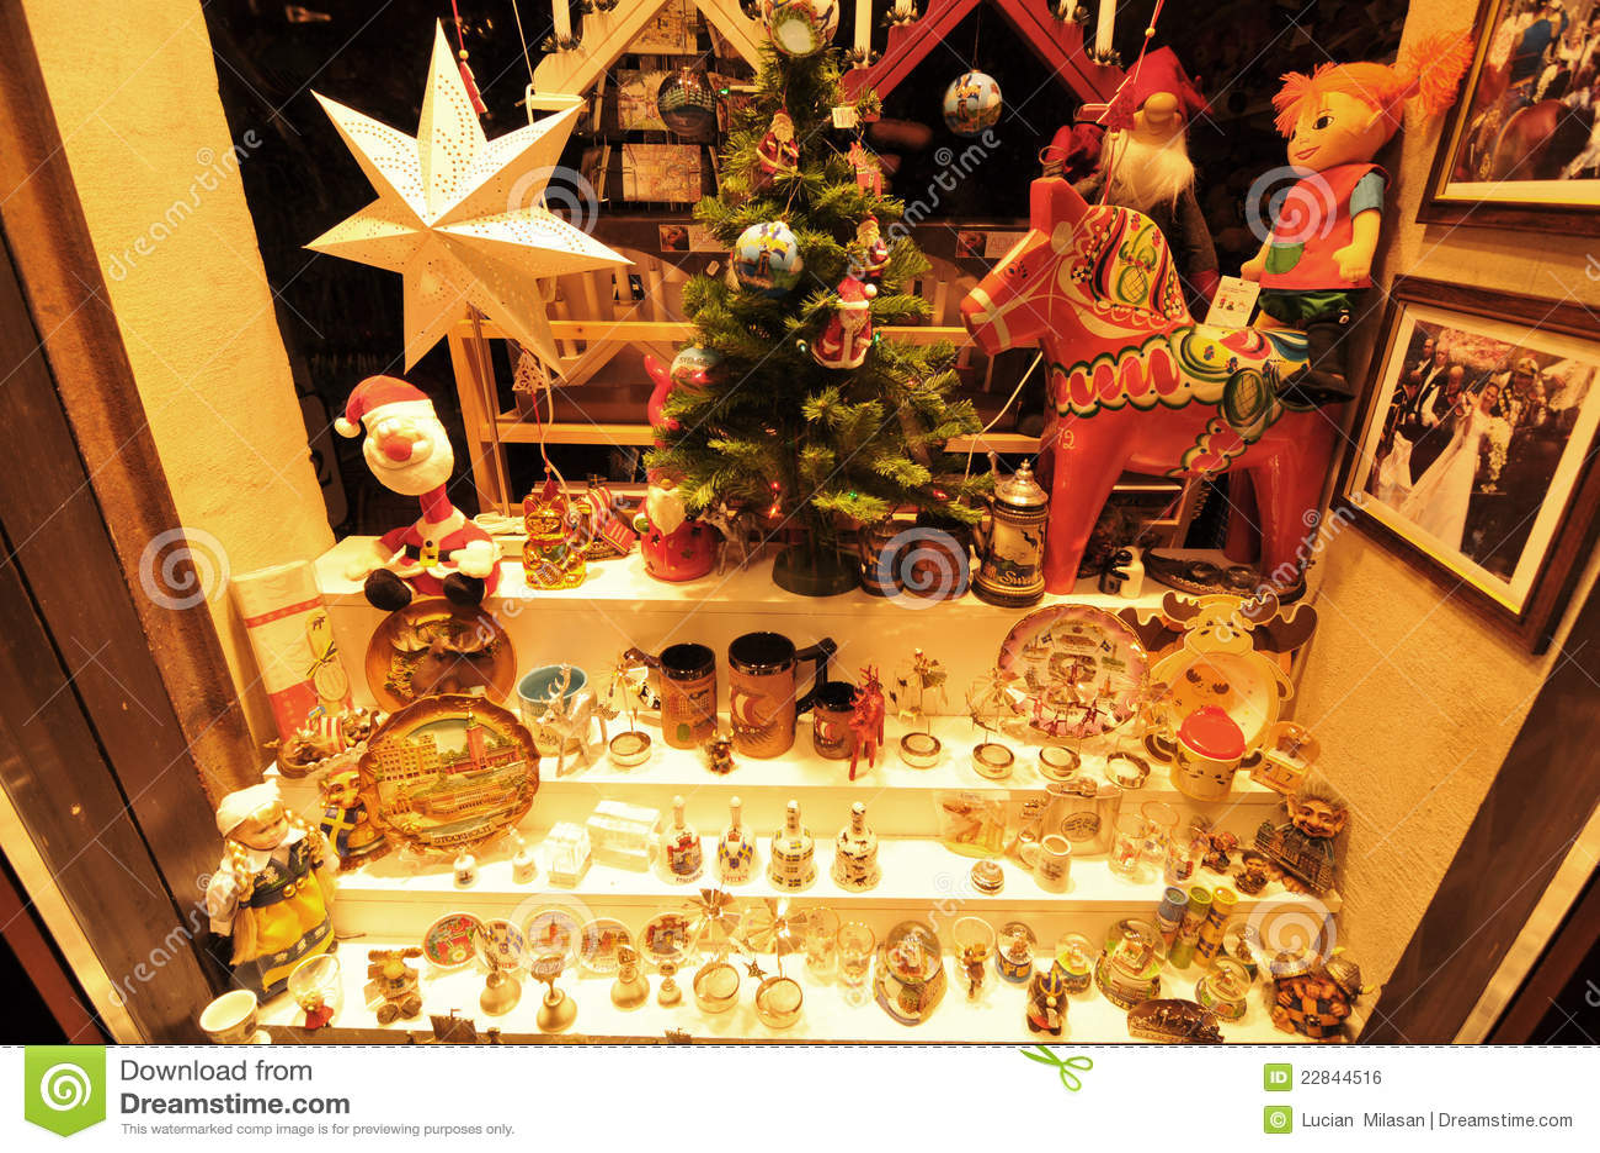 ... 12 Dec, 2011: Souvenirs window shop in central Stockholm at Christmas